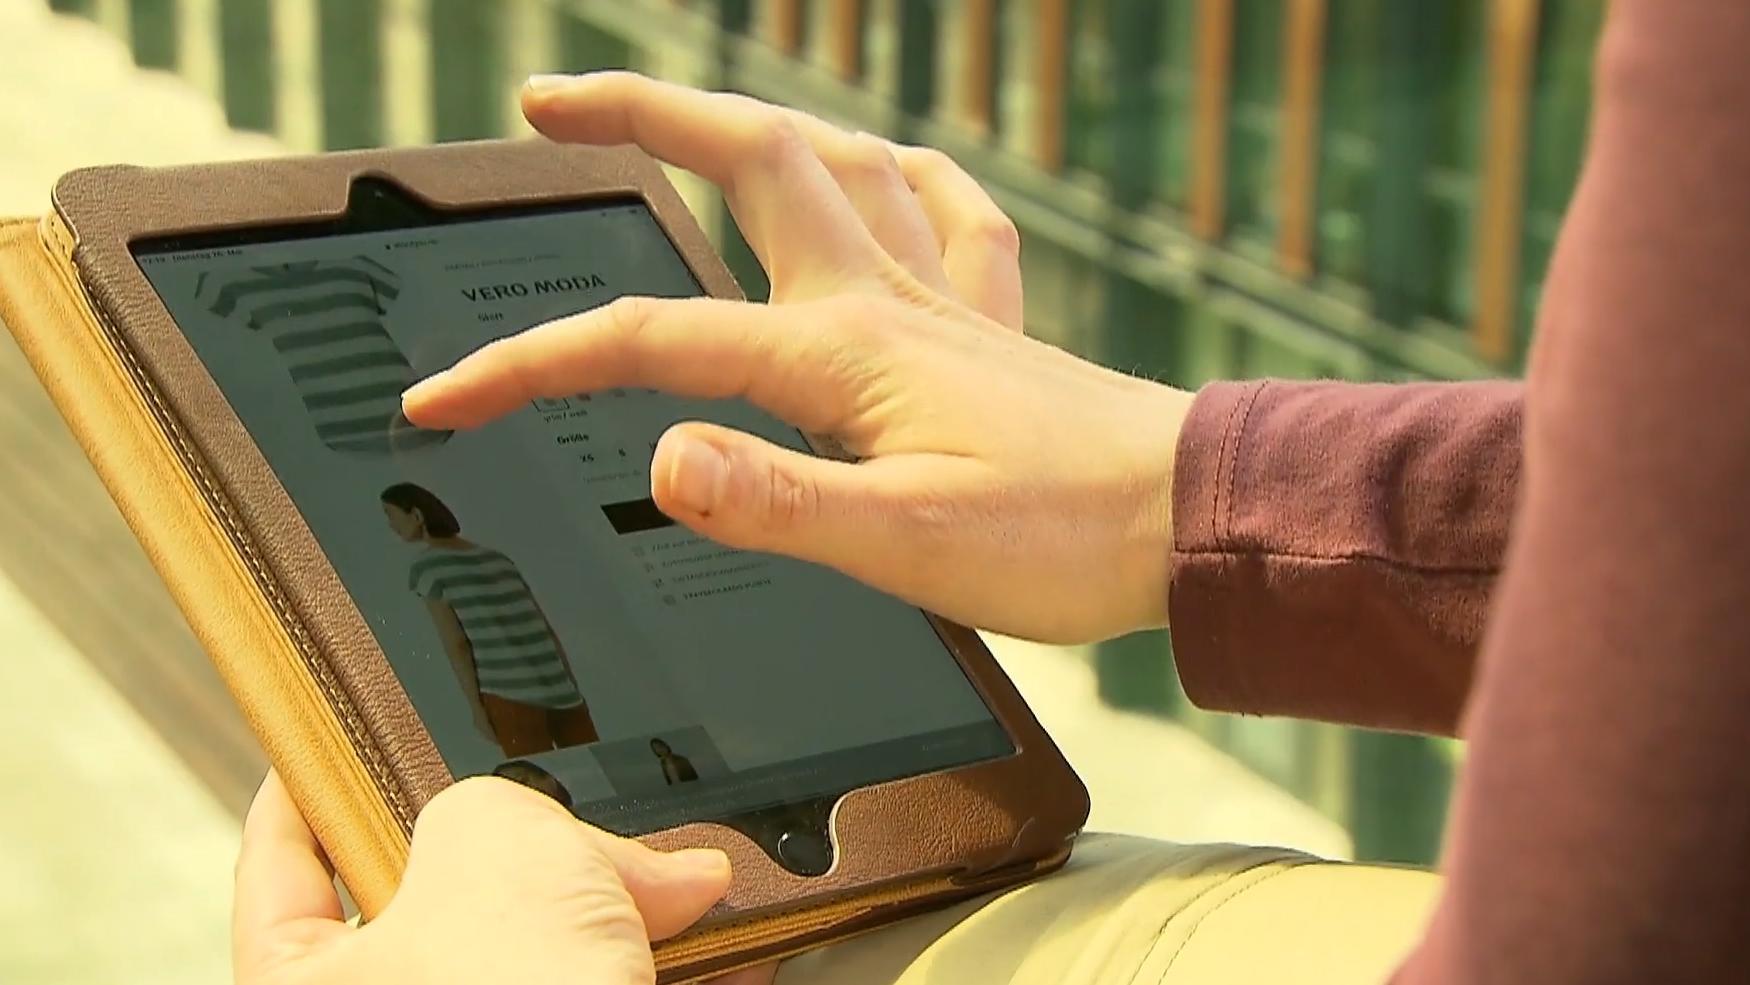 Große Onlineshops geben Mehrwersteuersenkung kaum weiter